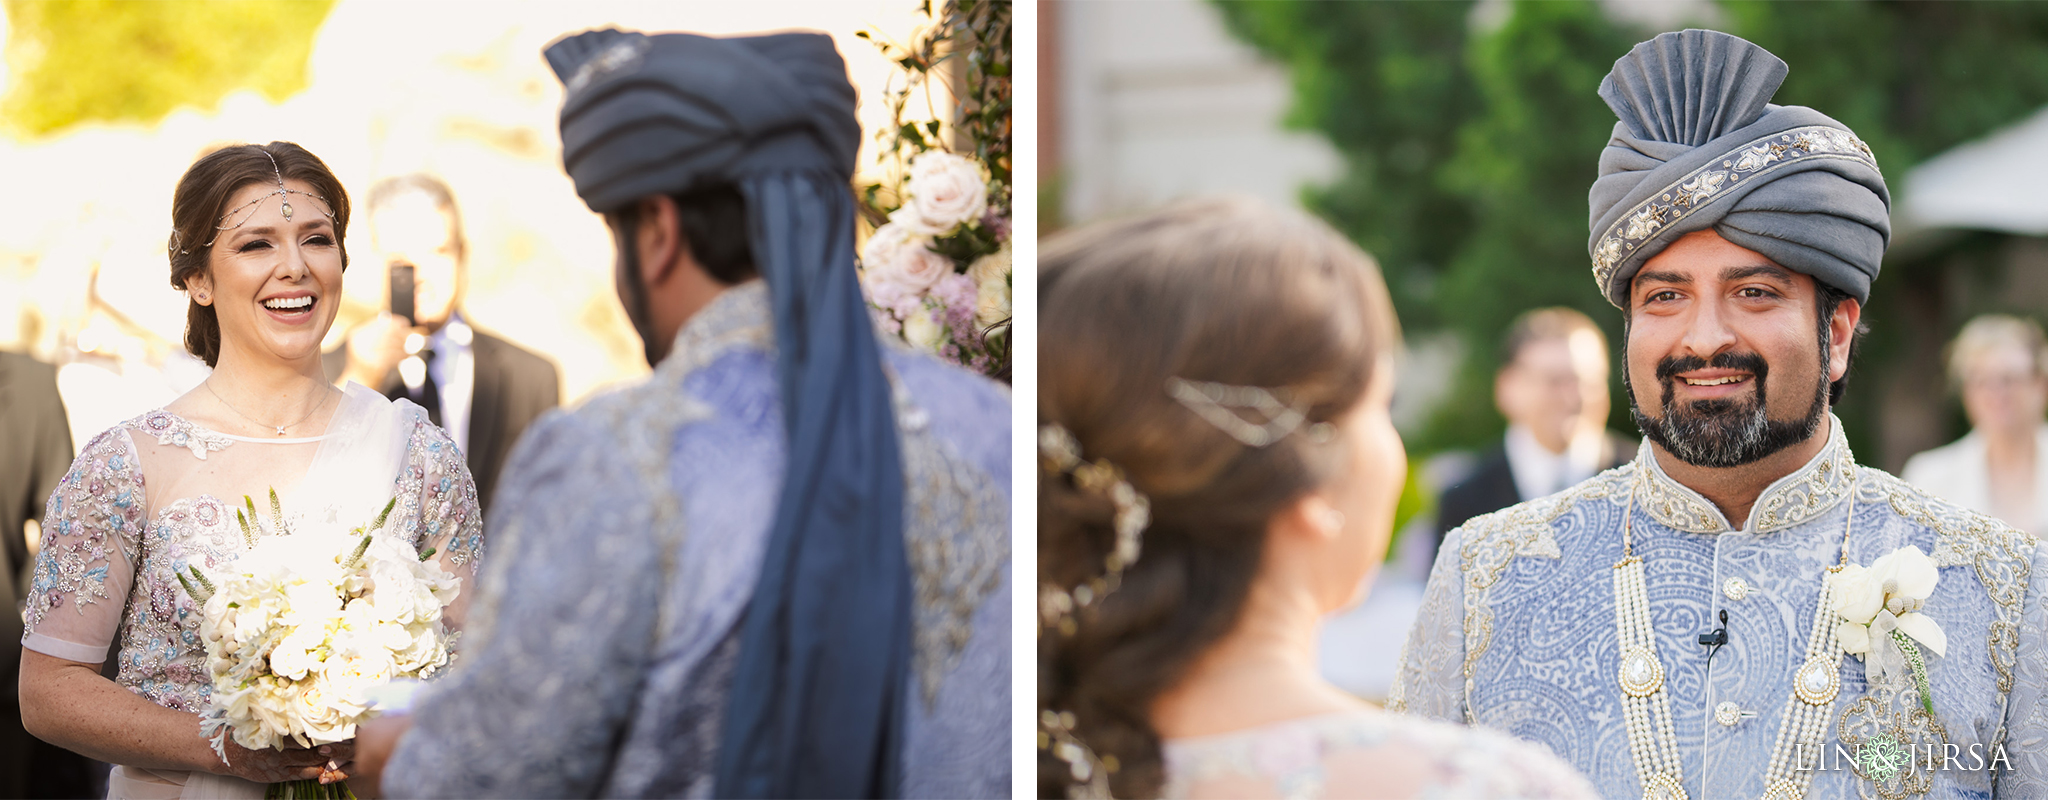 19 Four Seasons Westlake Village Indian Wedding Photographer